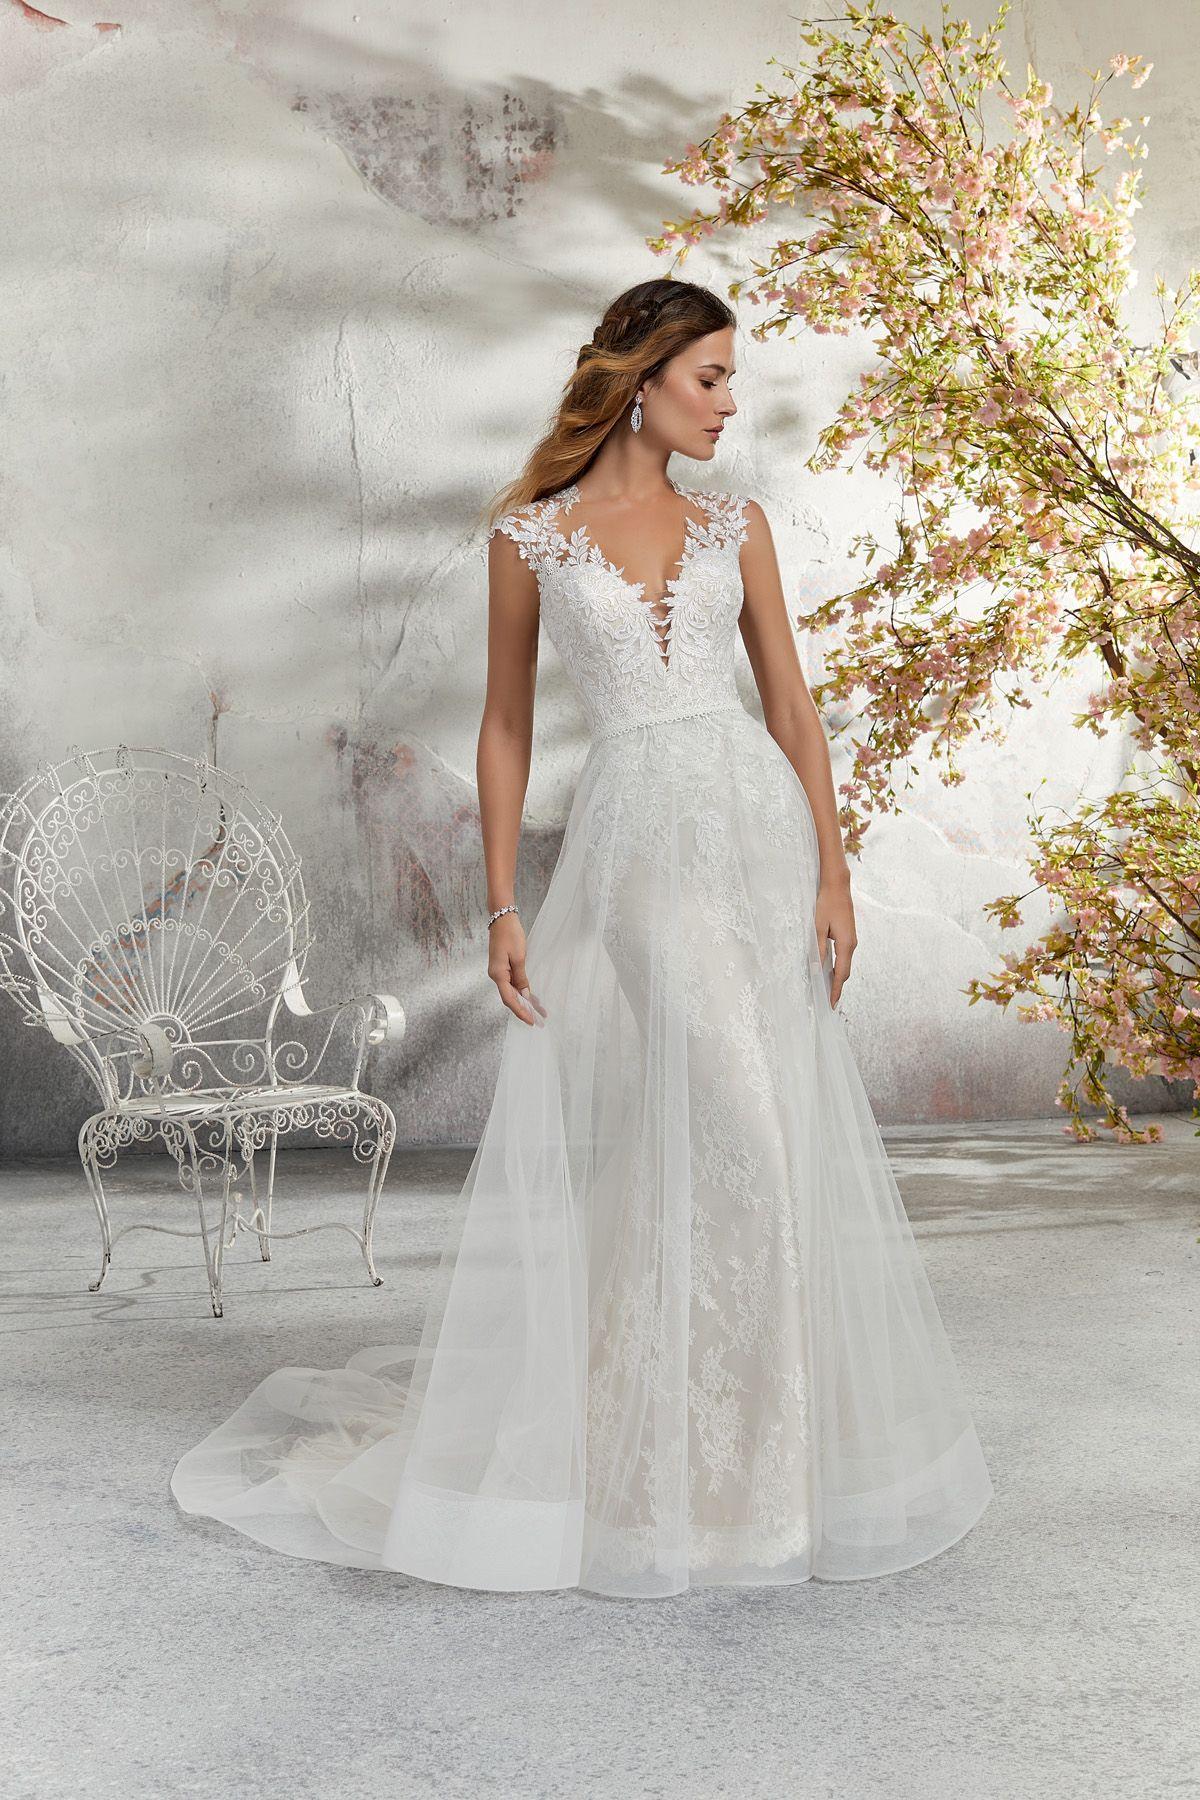 Mori lee wedding dresses in sydney in weddings pinterest